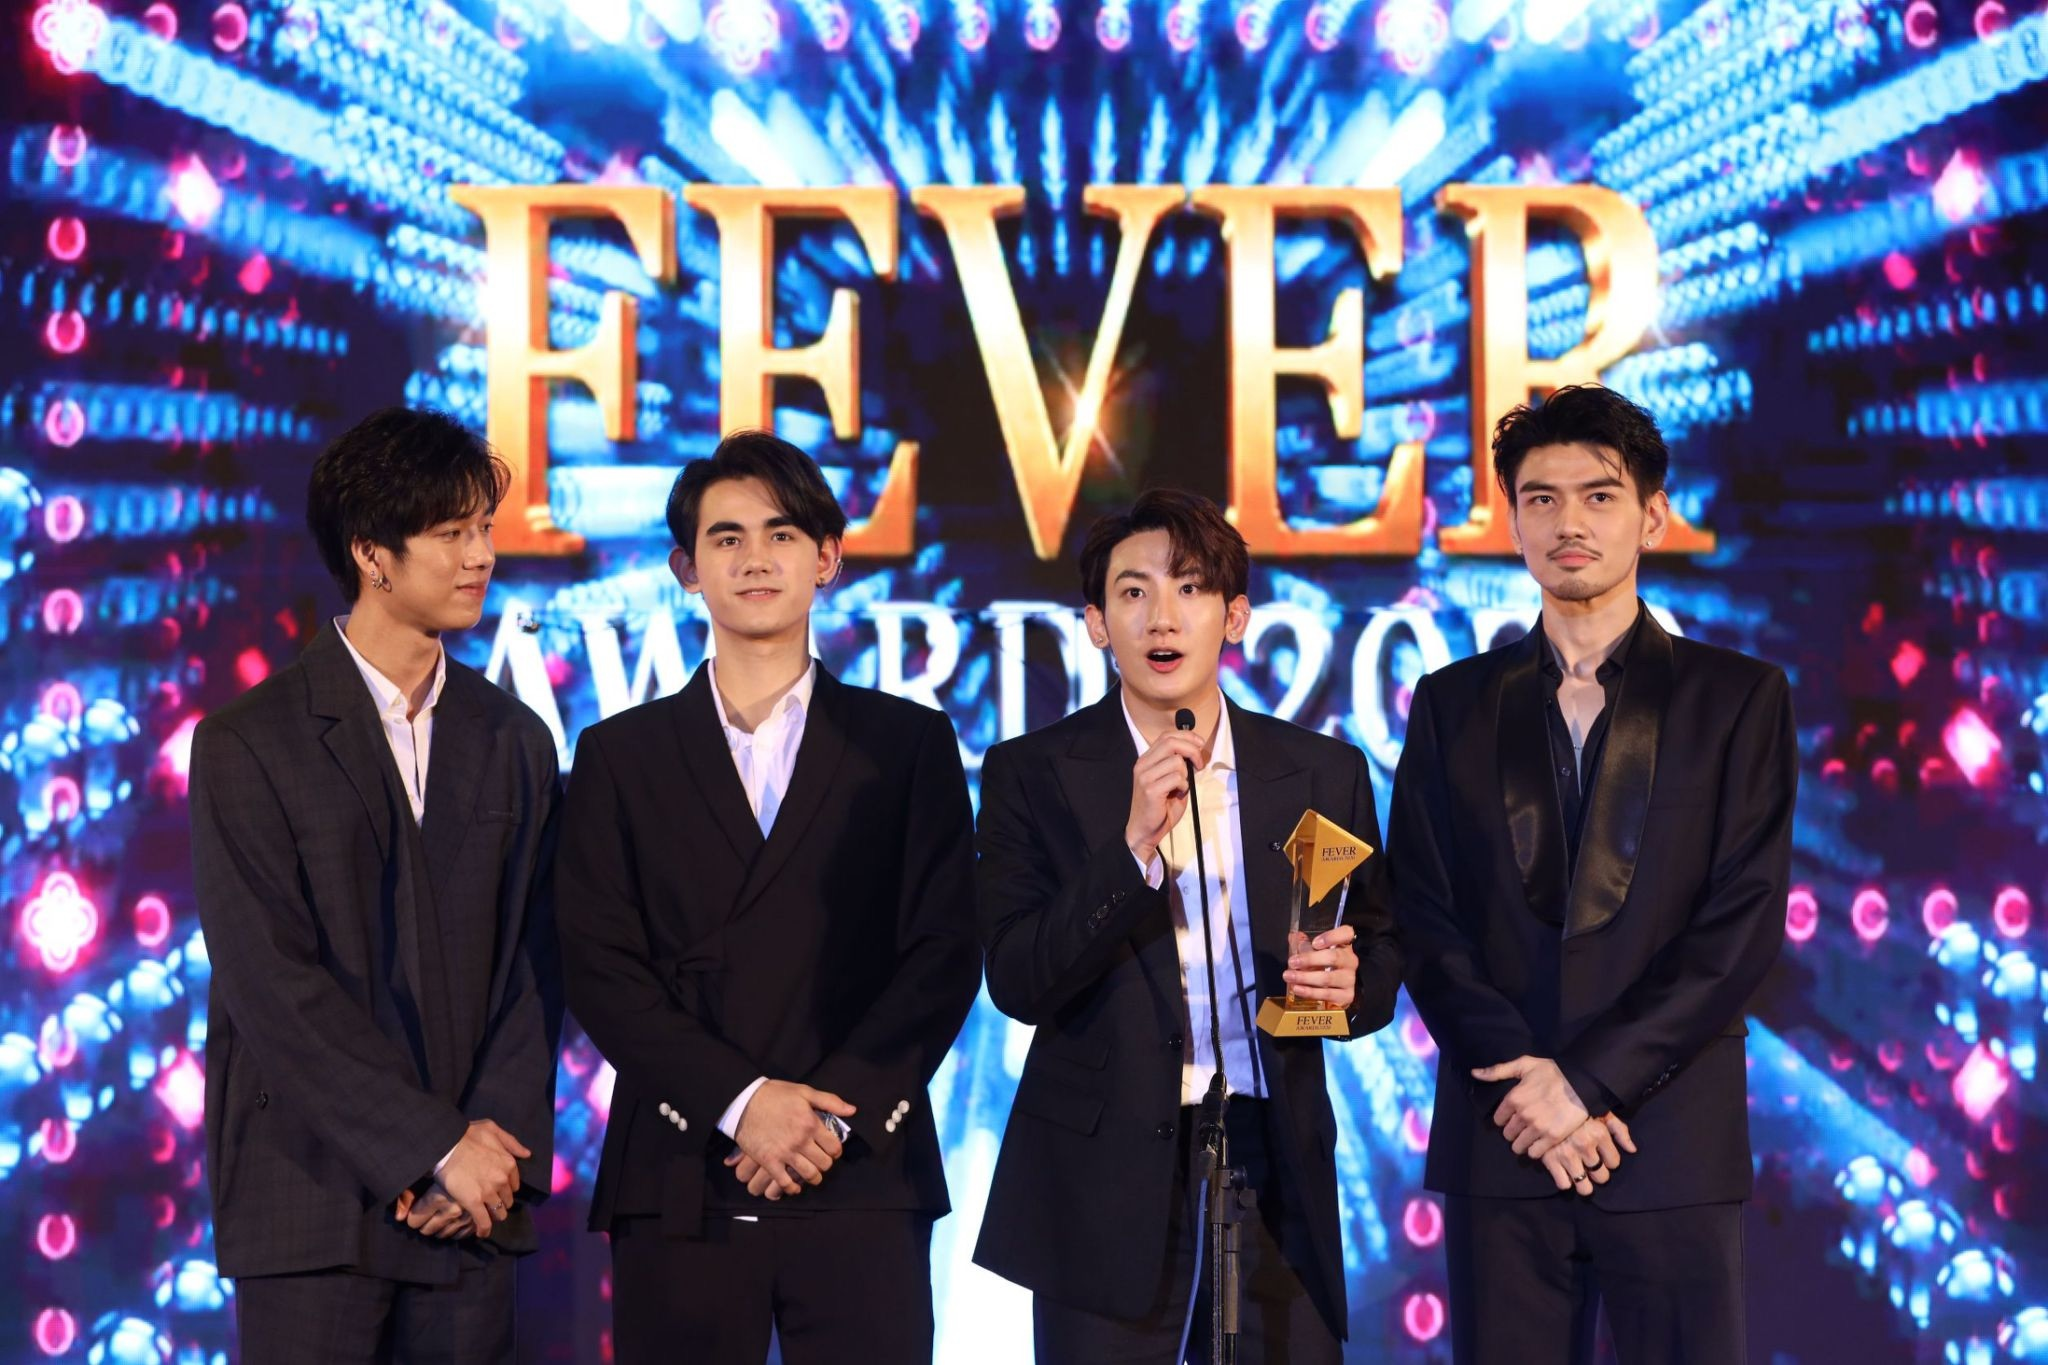 Fever Awards 2020